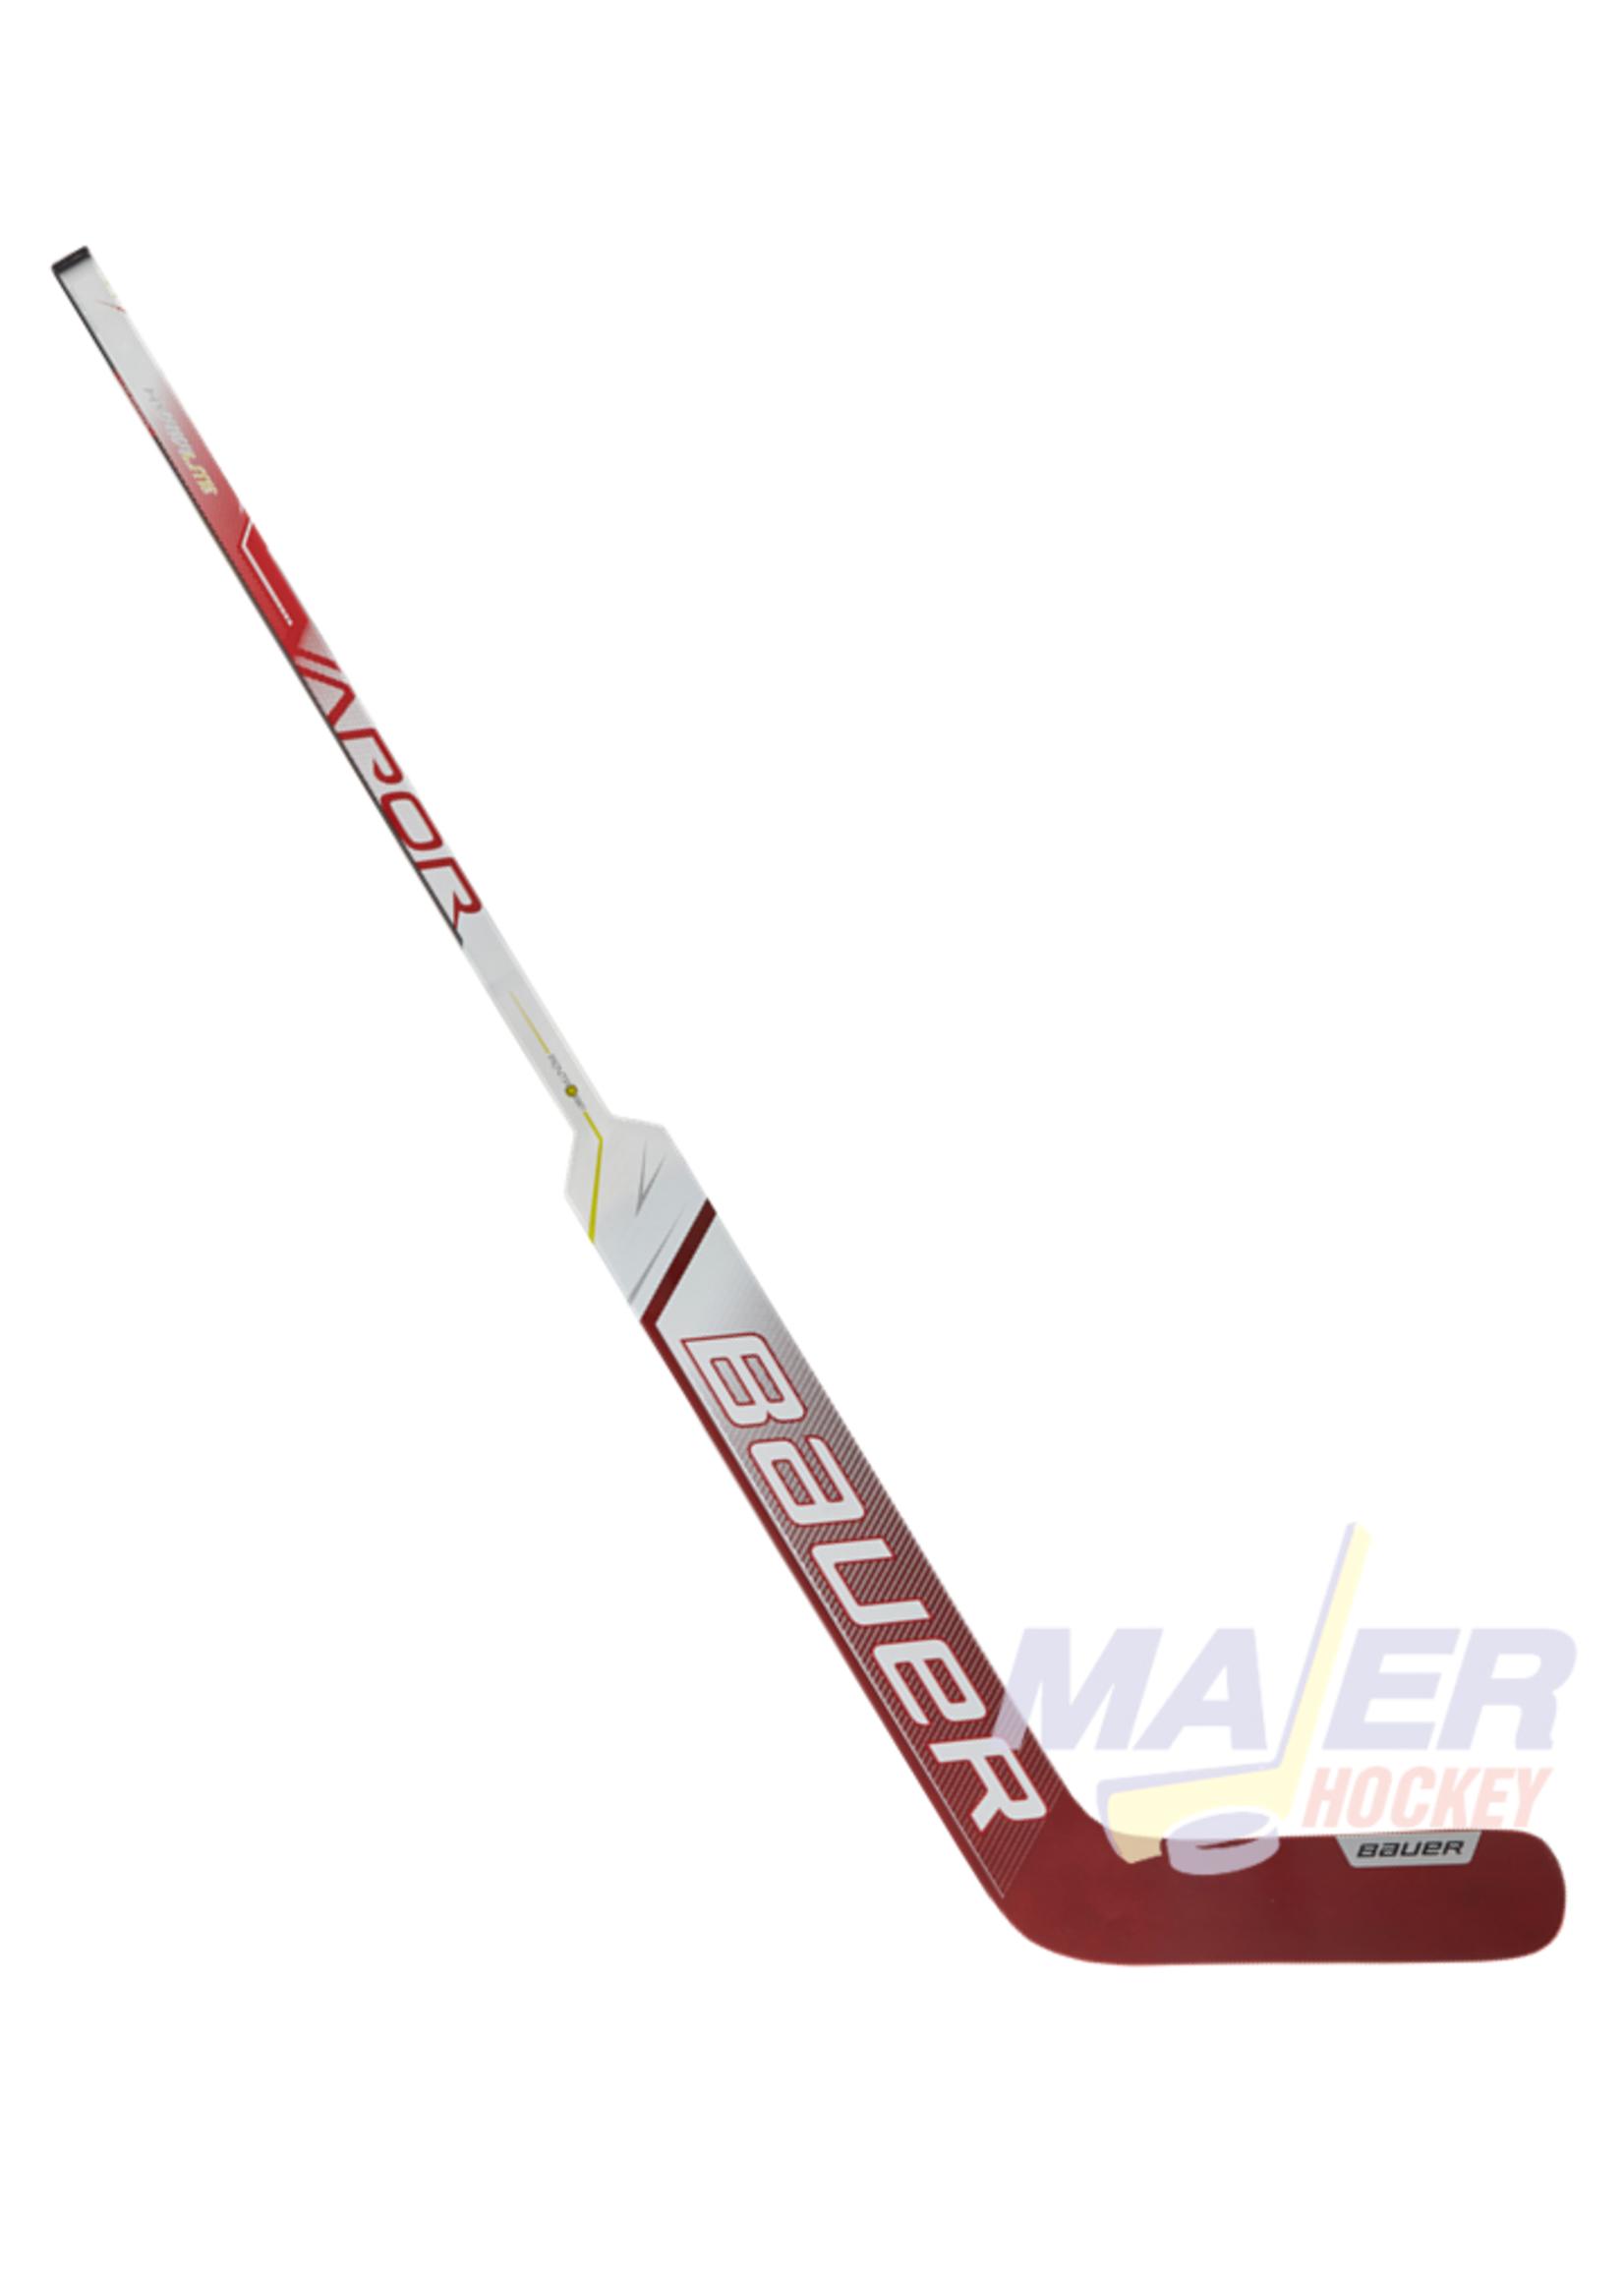 Bauer Vapor Hyperlite Sr Goalie Stick